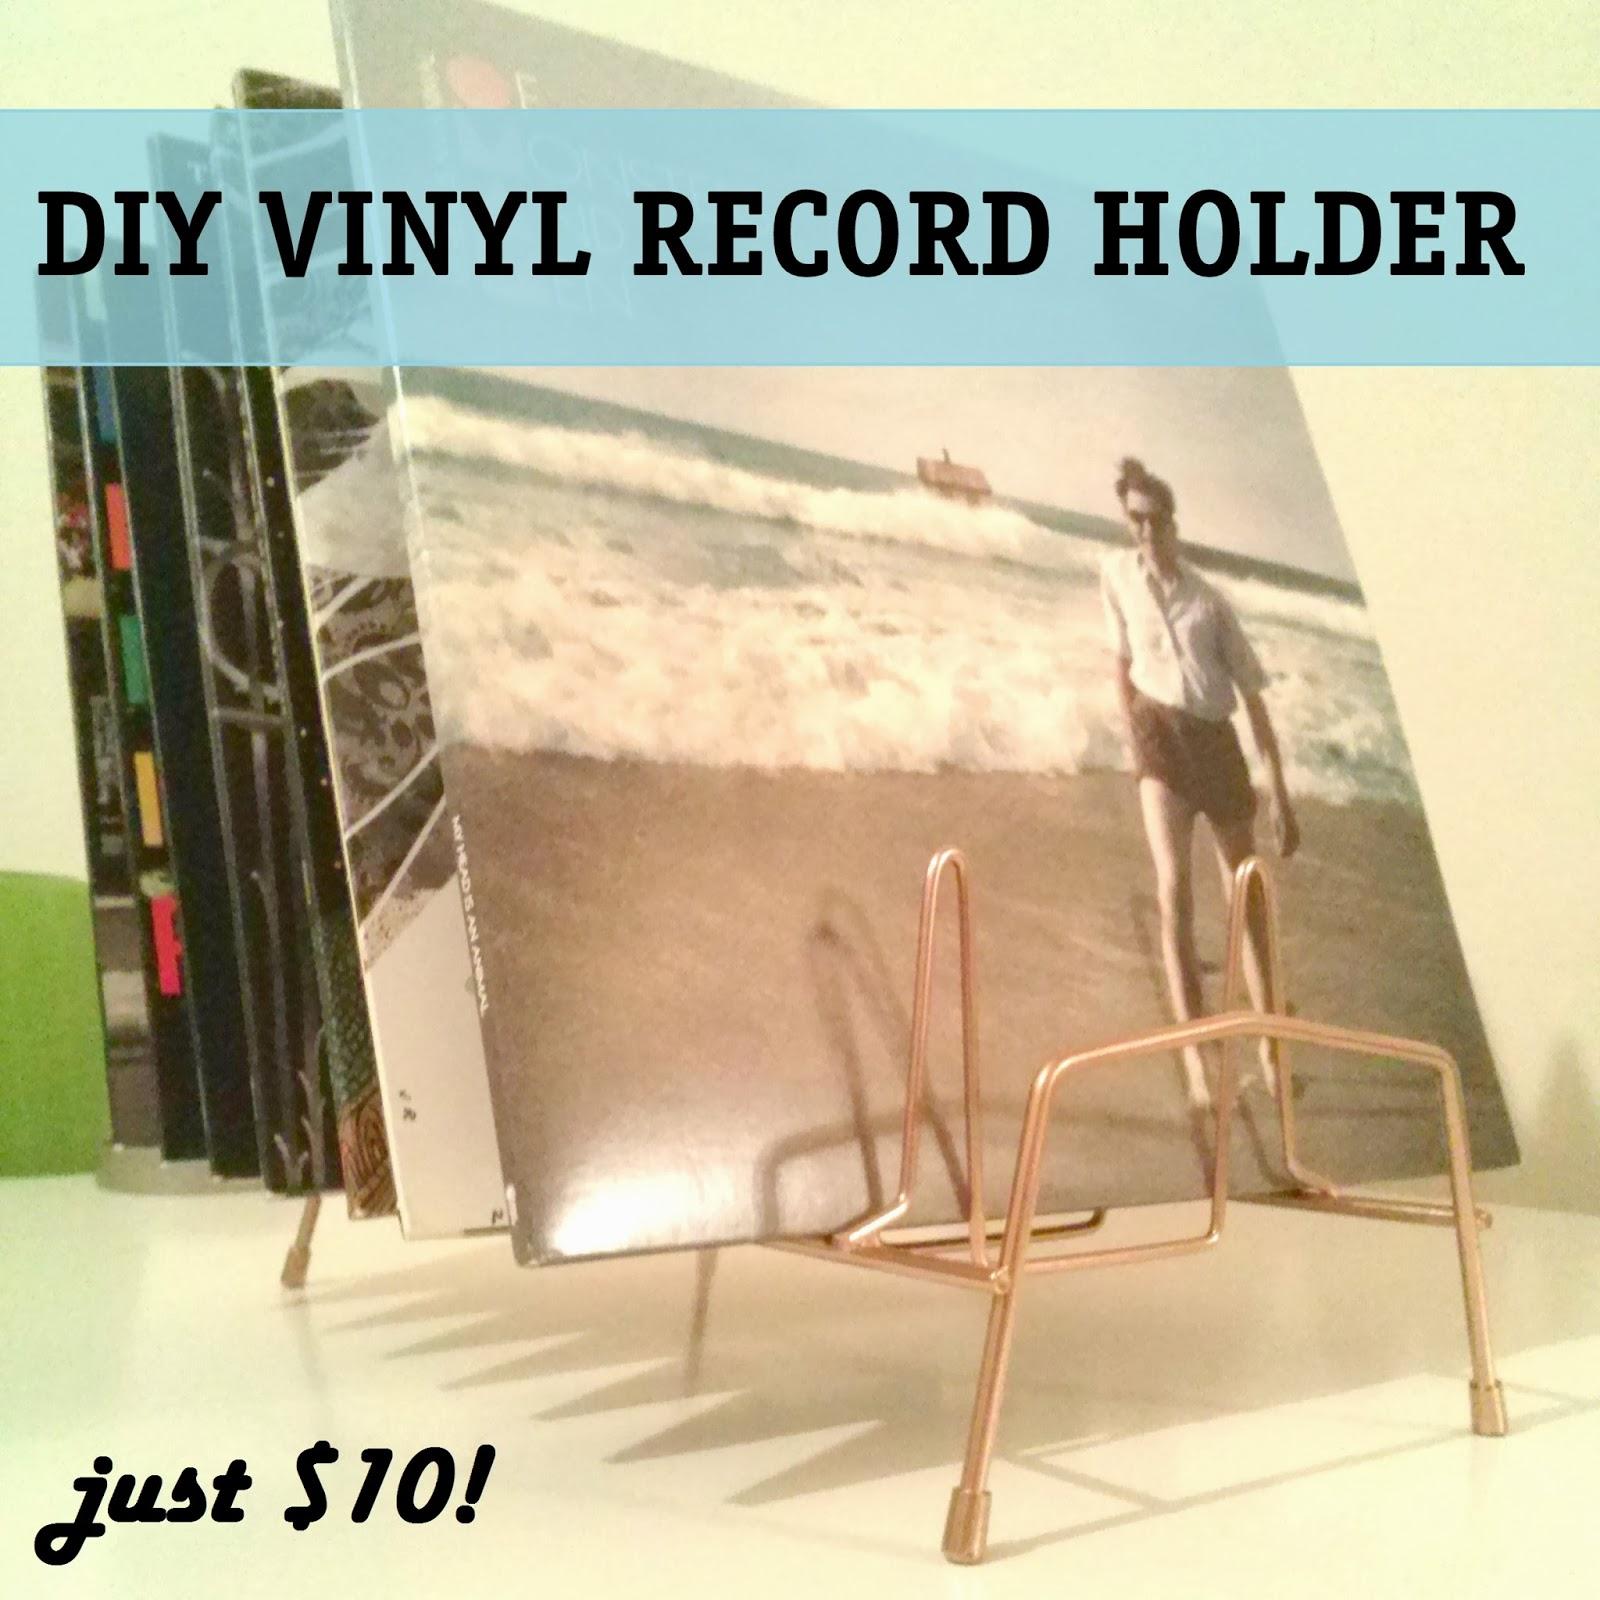 Diy Vinyl Book Cover : The lovely side diy quickie copper vinyl record holder